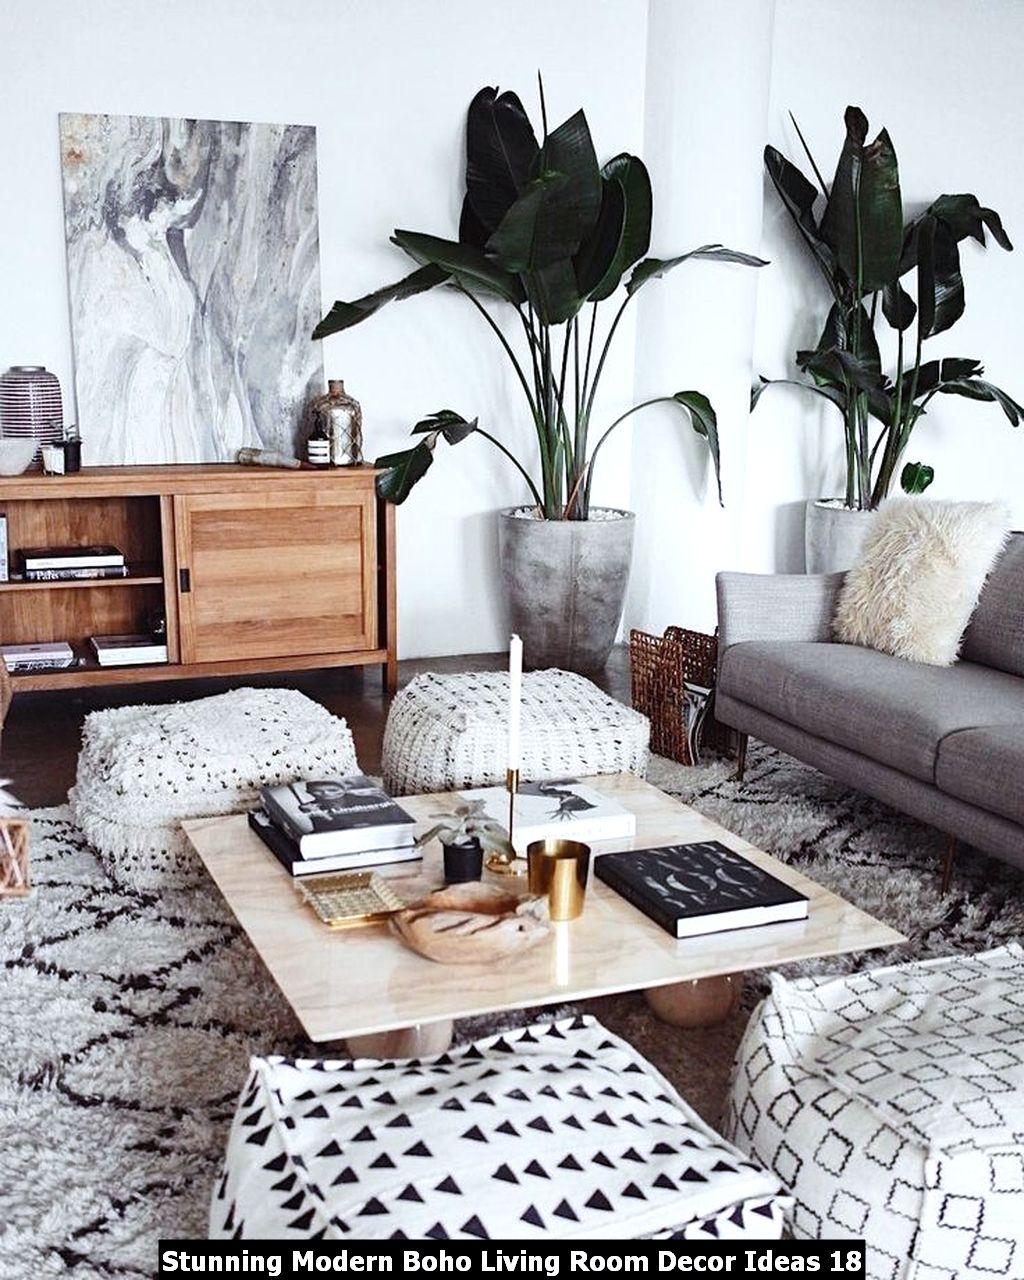 Stunning Modern Boho Living Room Decor Ideas 18